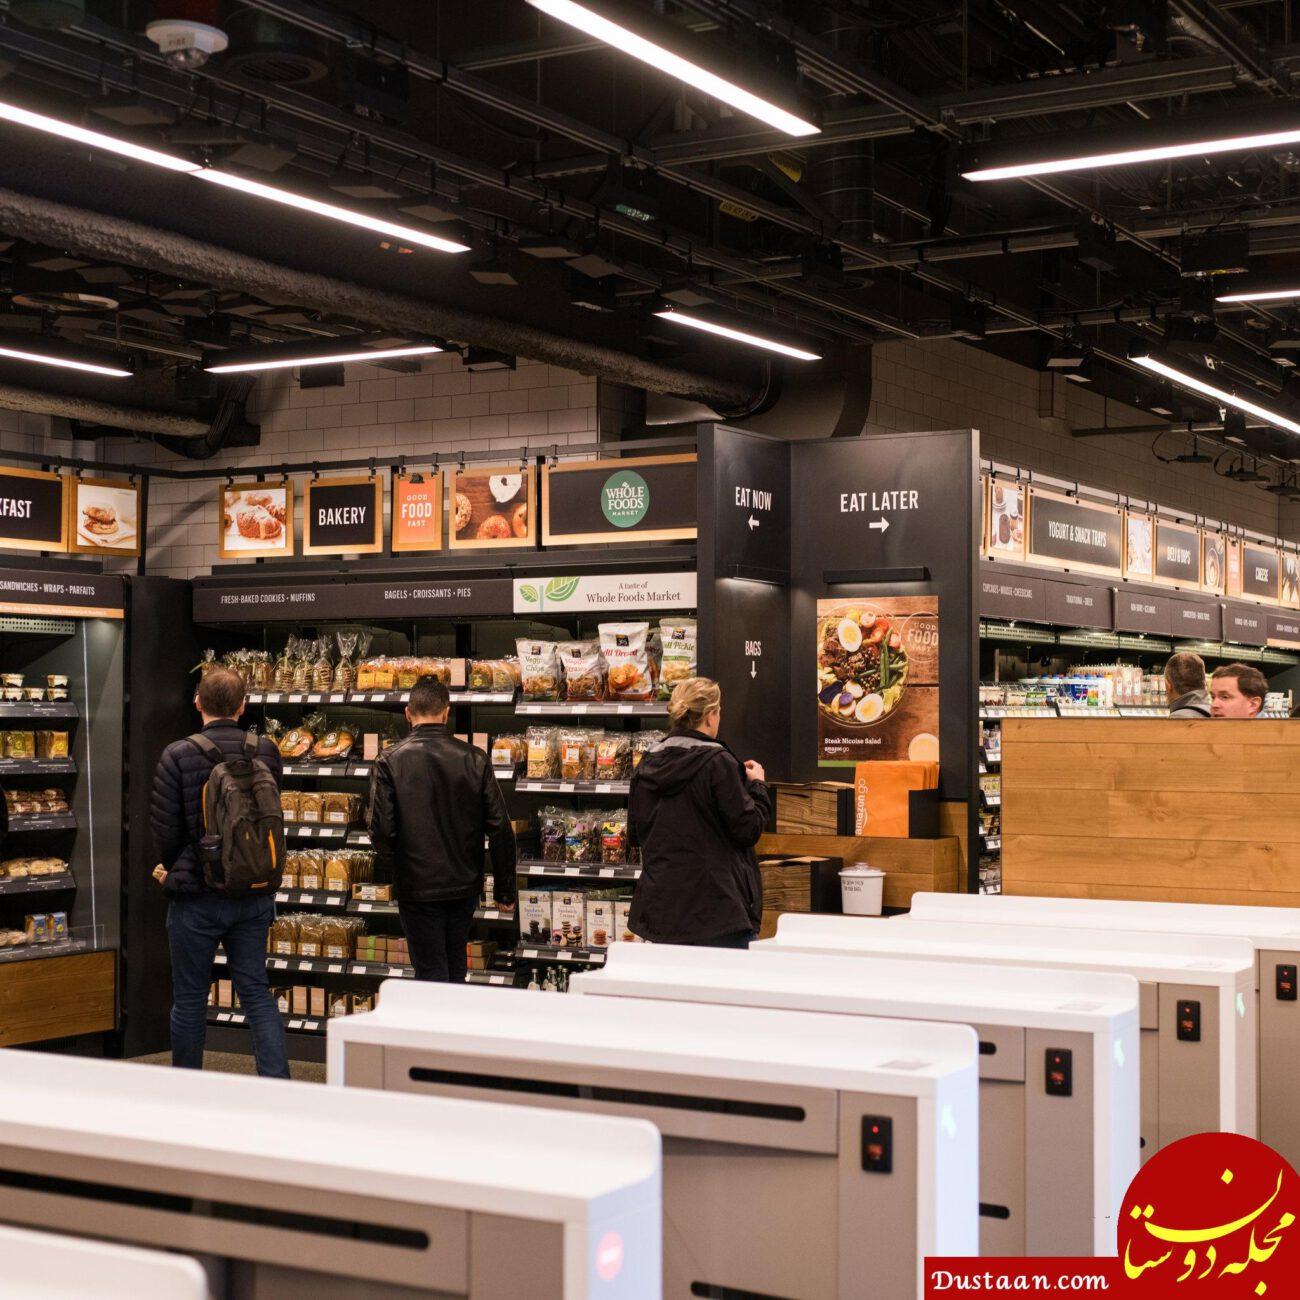 www.dustaan.com رونمایی از بقالی آنلاین آمازون! +عکس